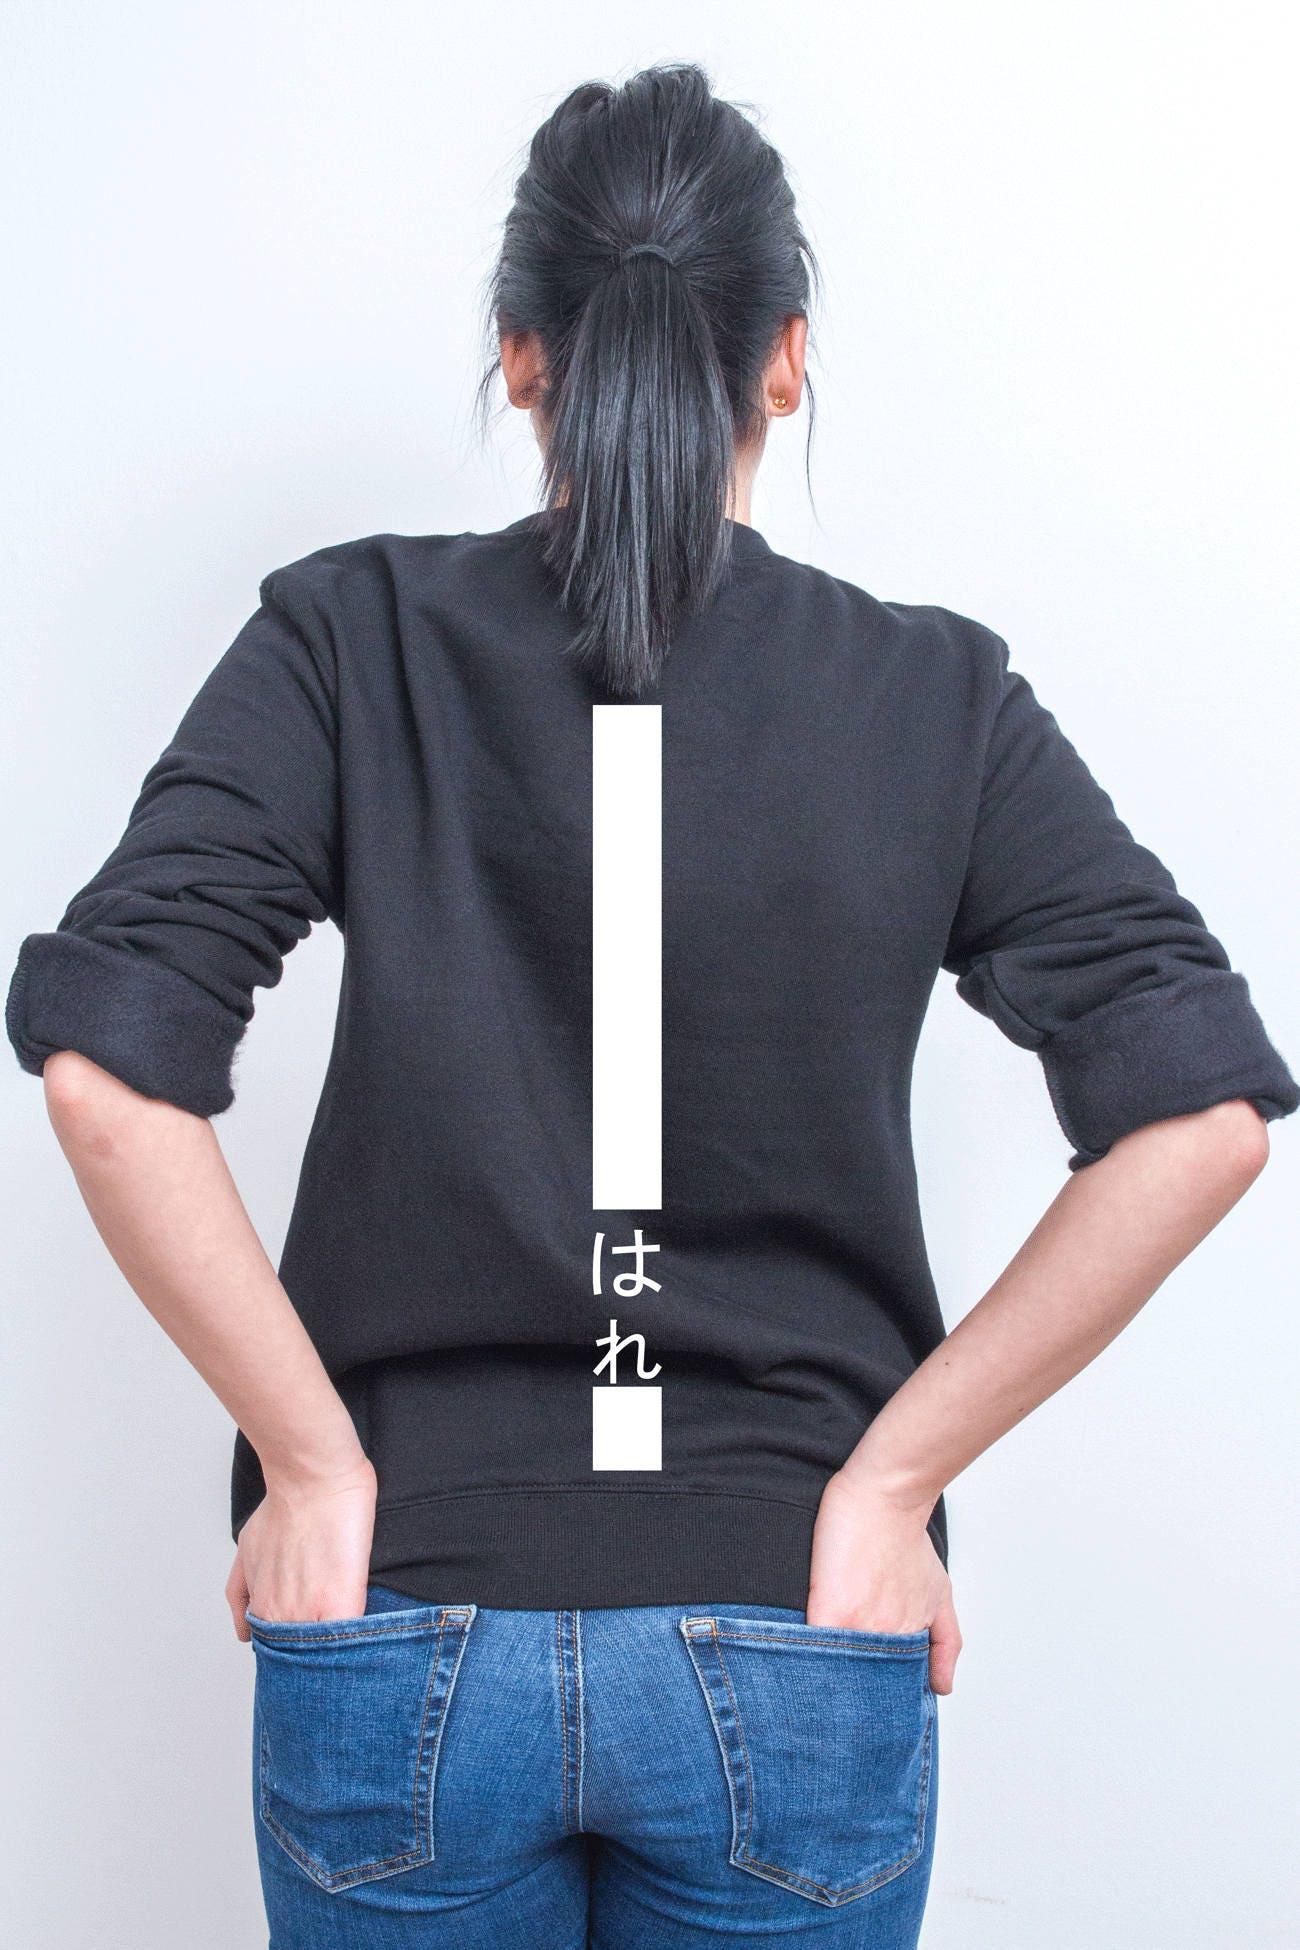 aesthetic sweatshirt hiragana calligraphic sweater